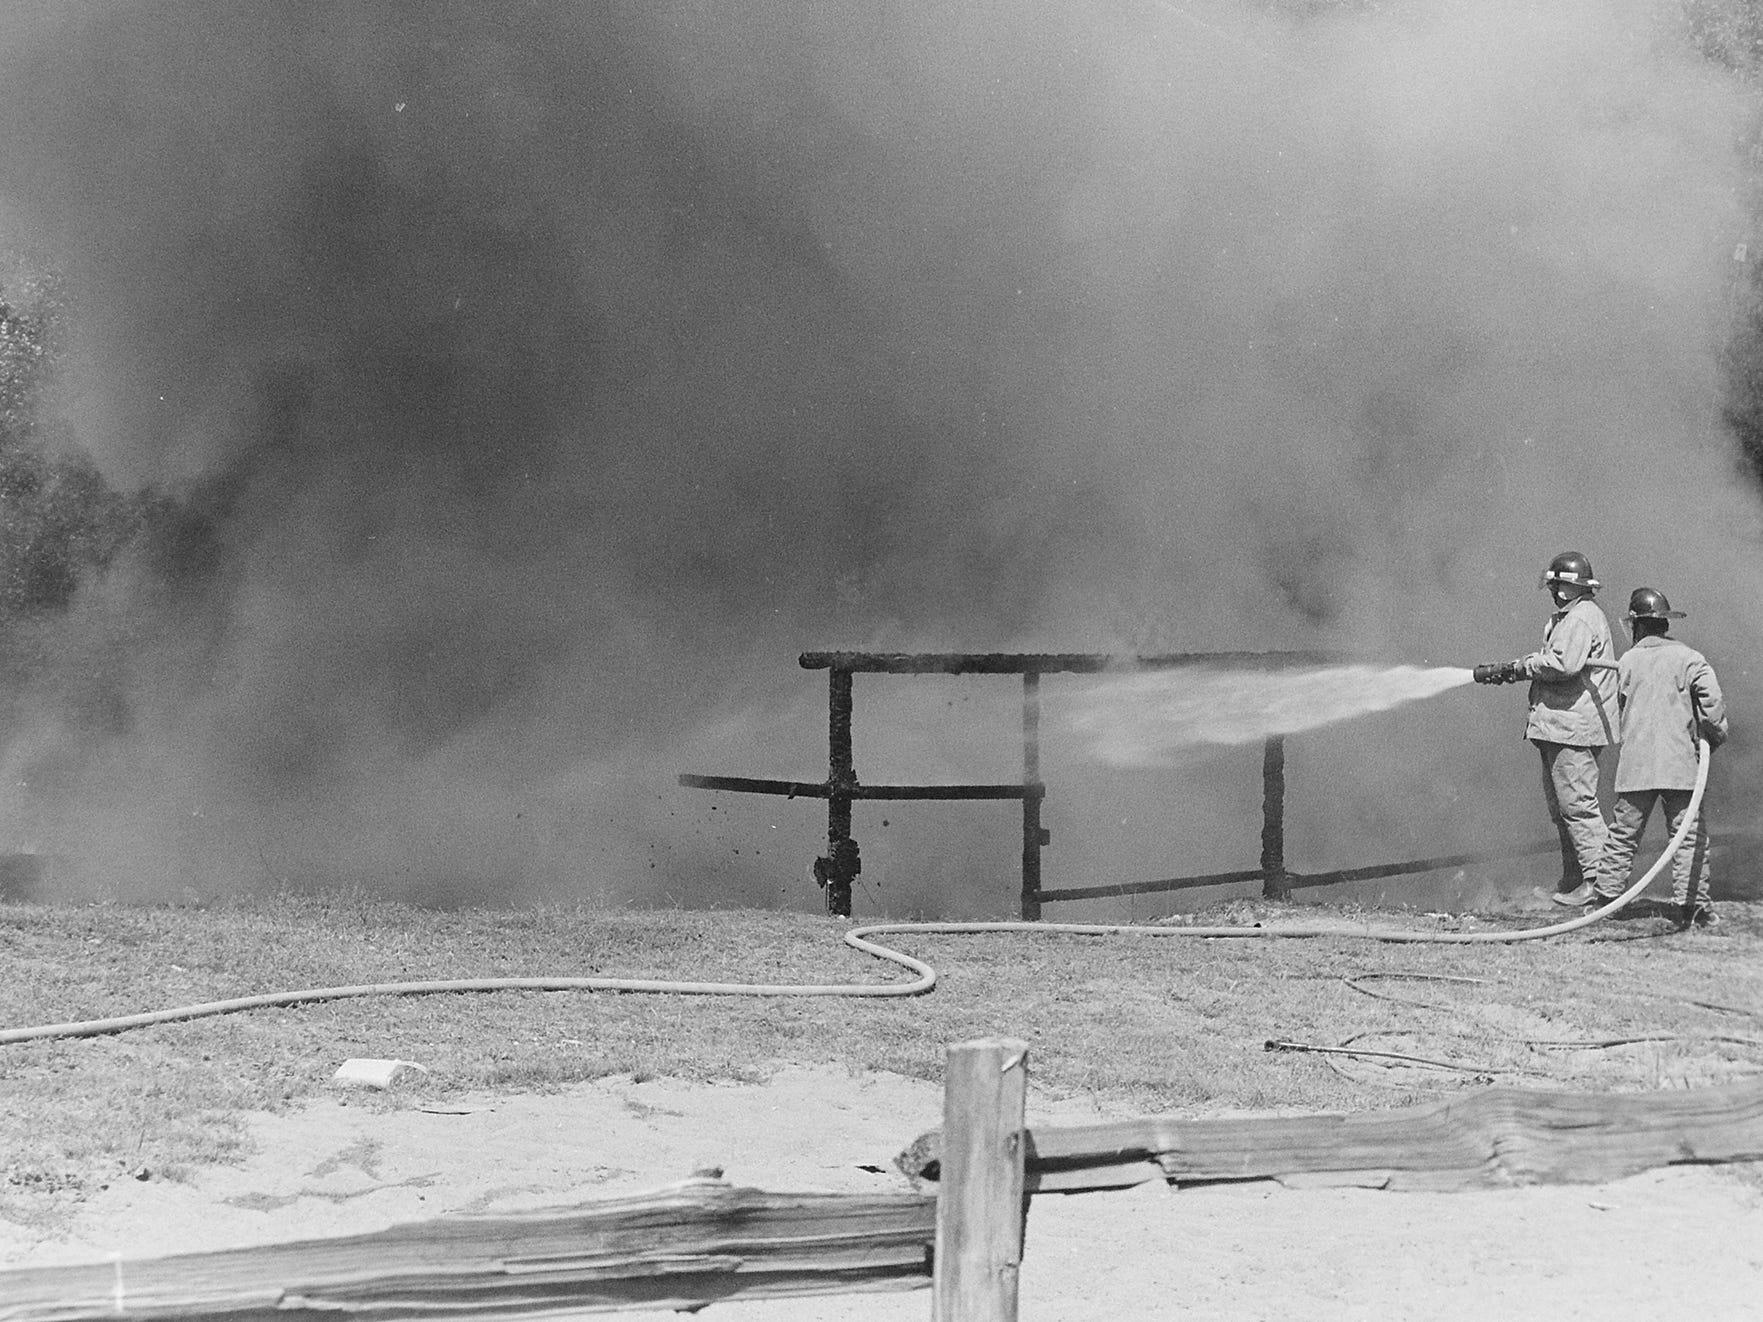 07/26/82Barn Fire